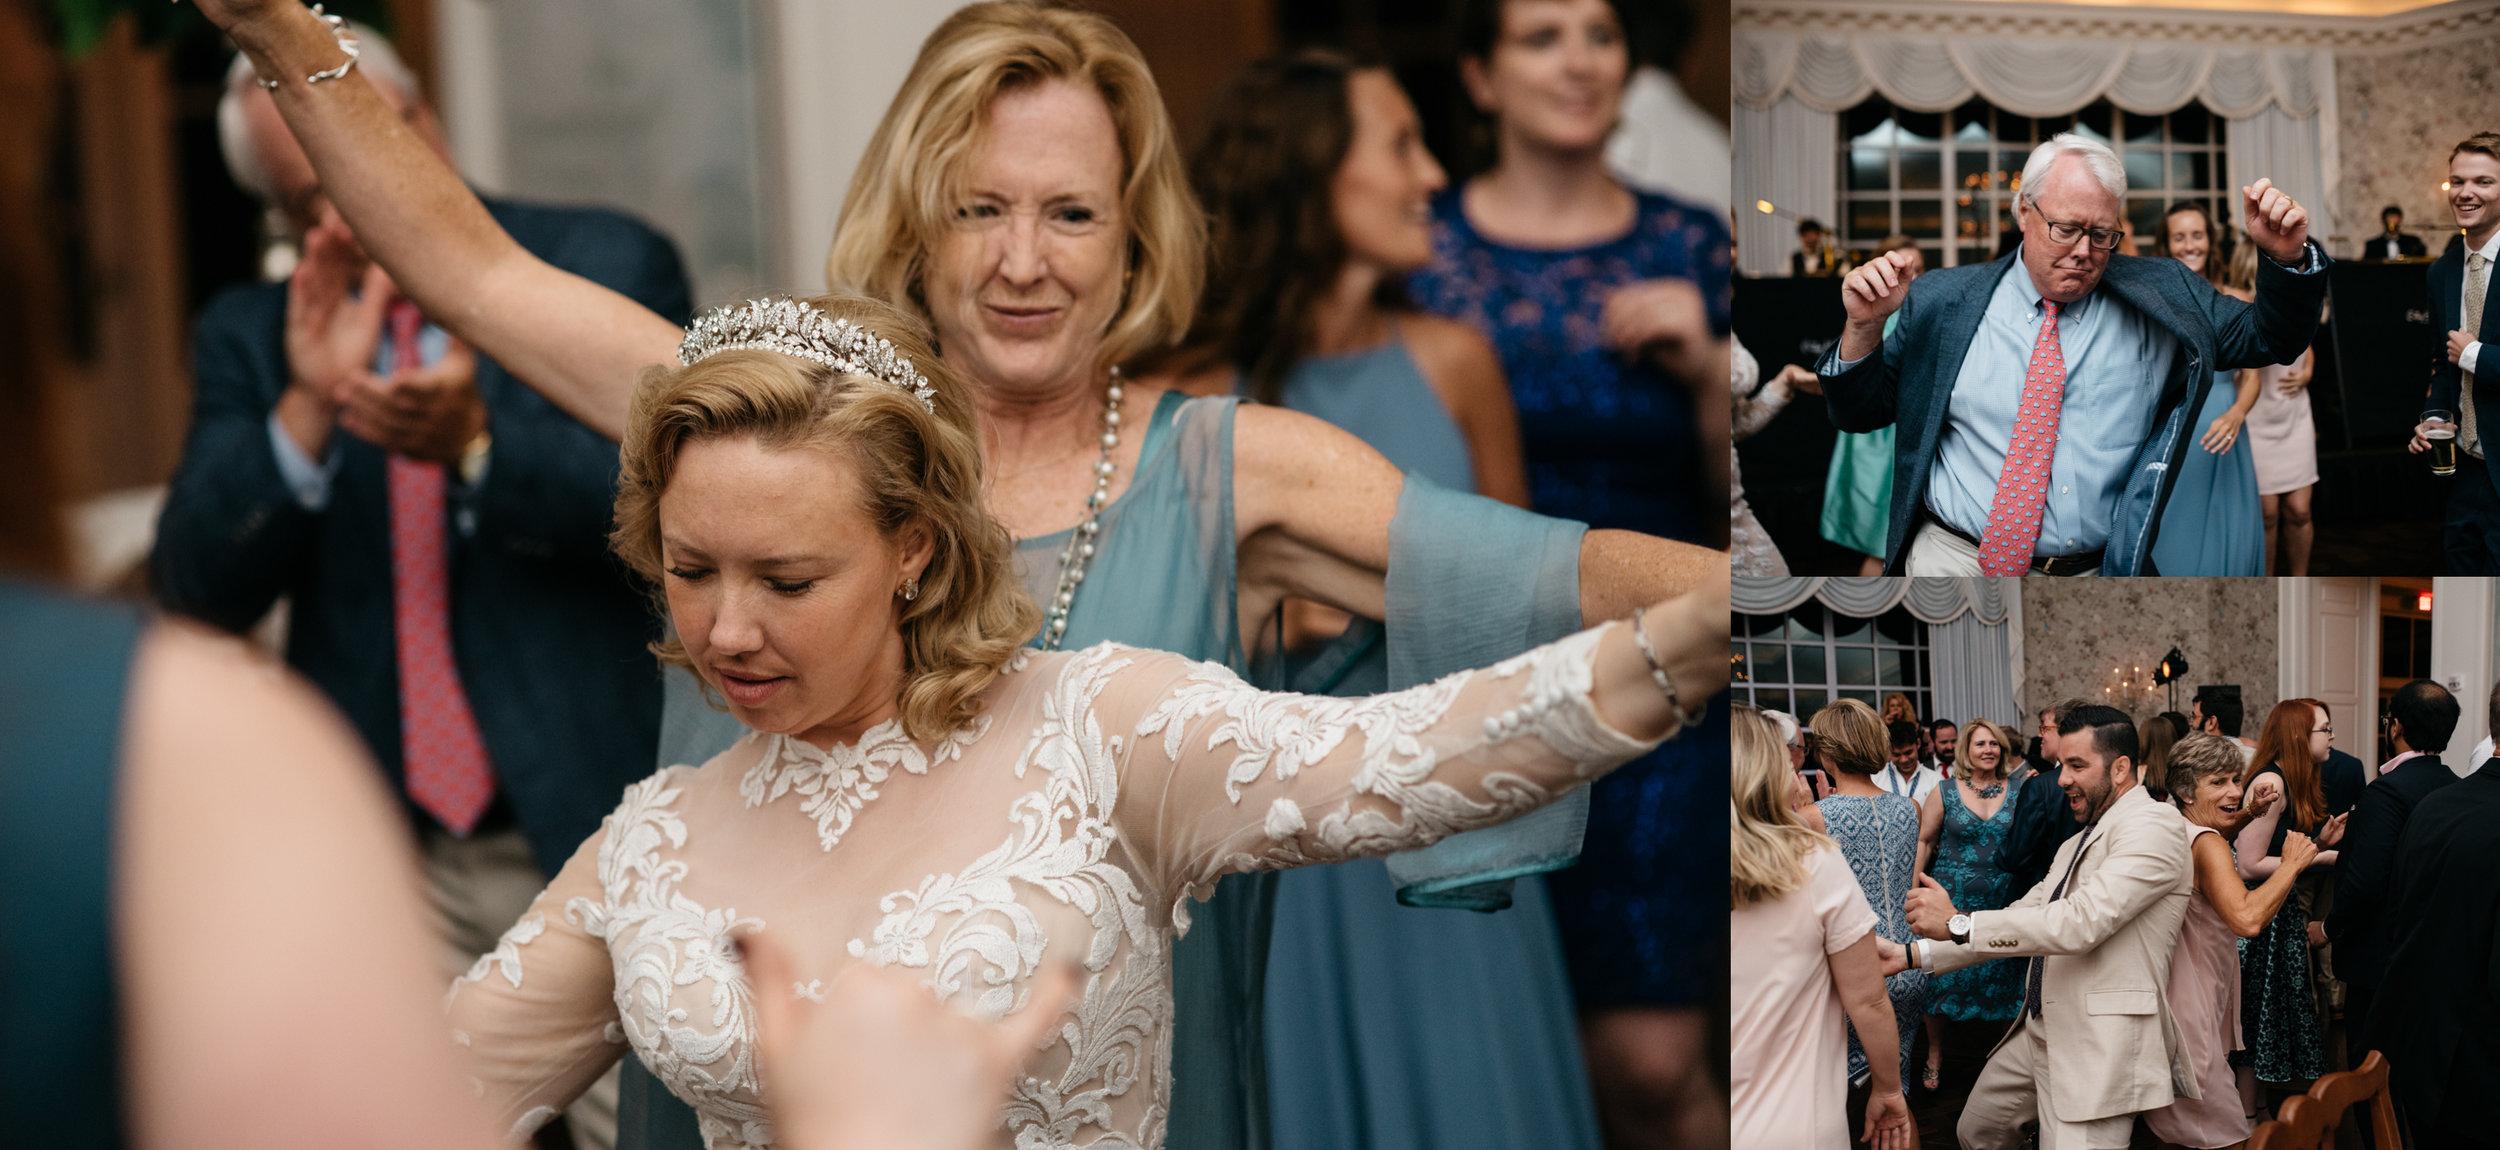 wedding reception photo.jpg